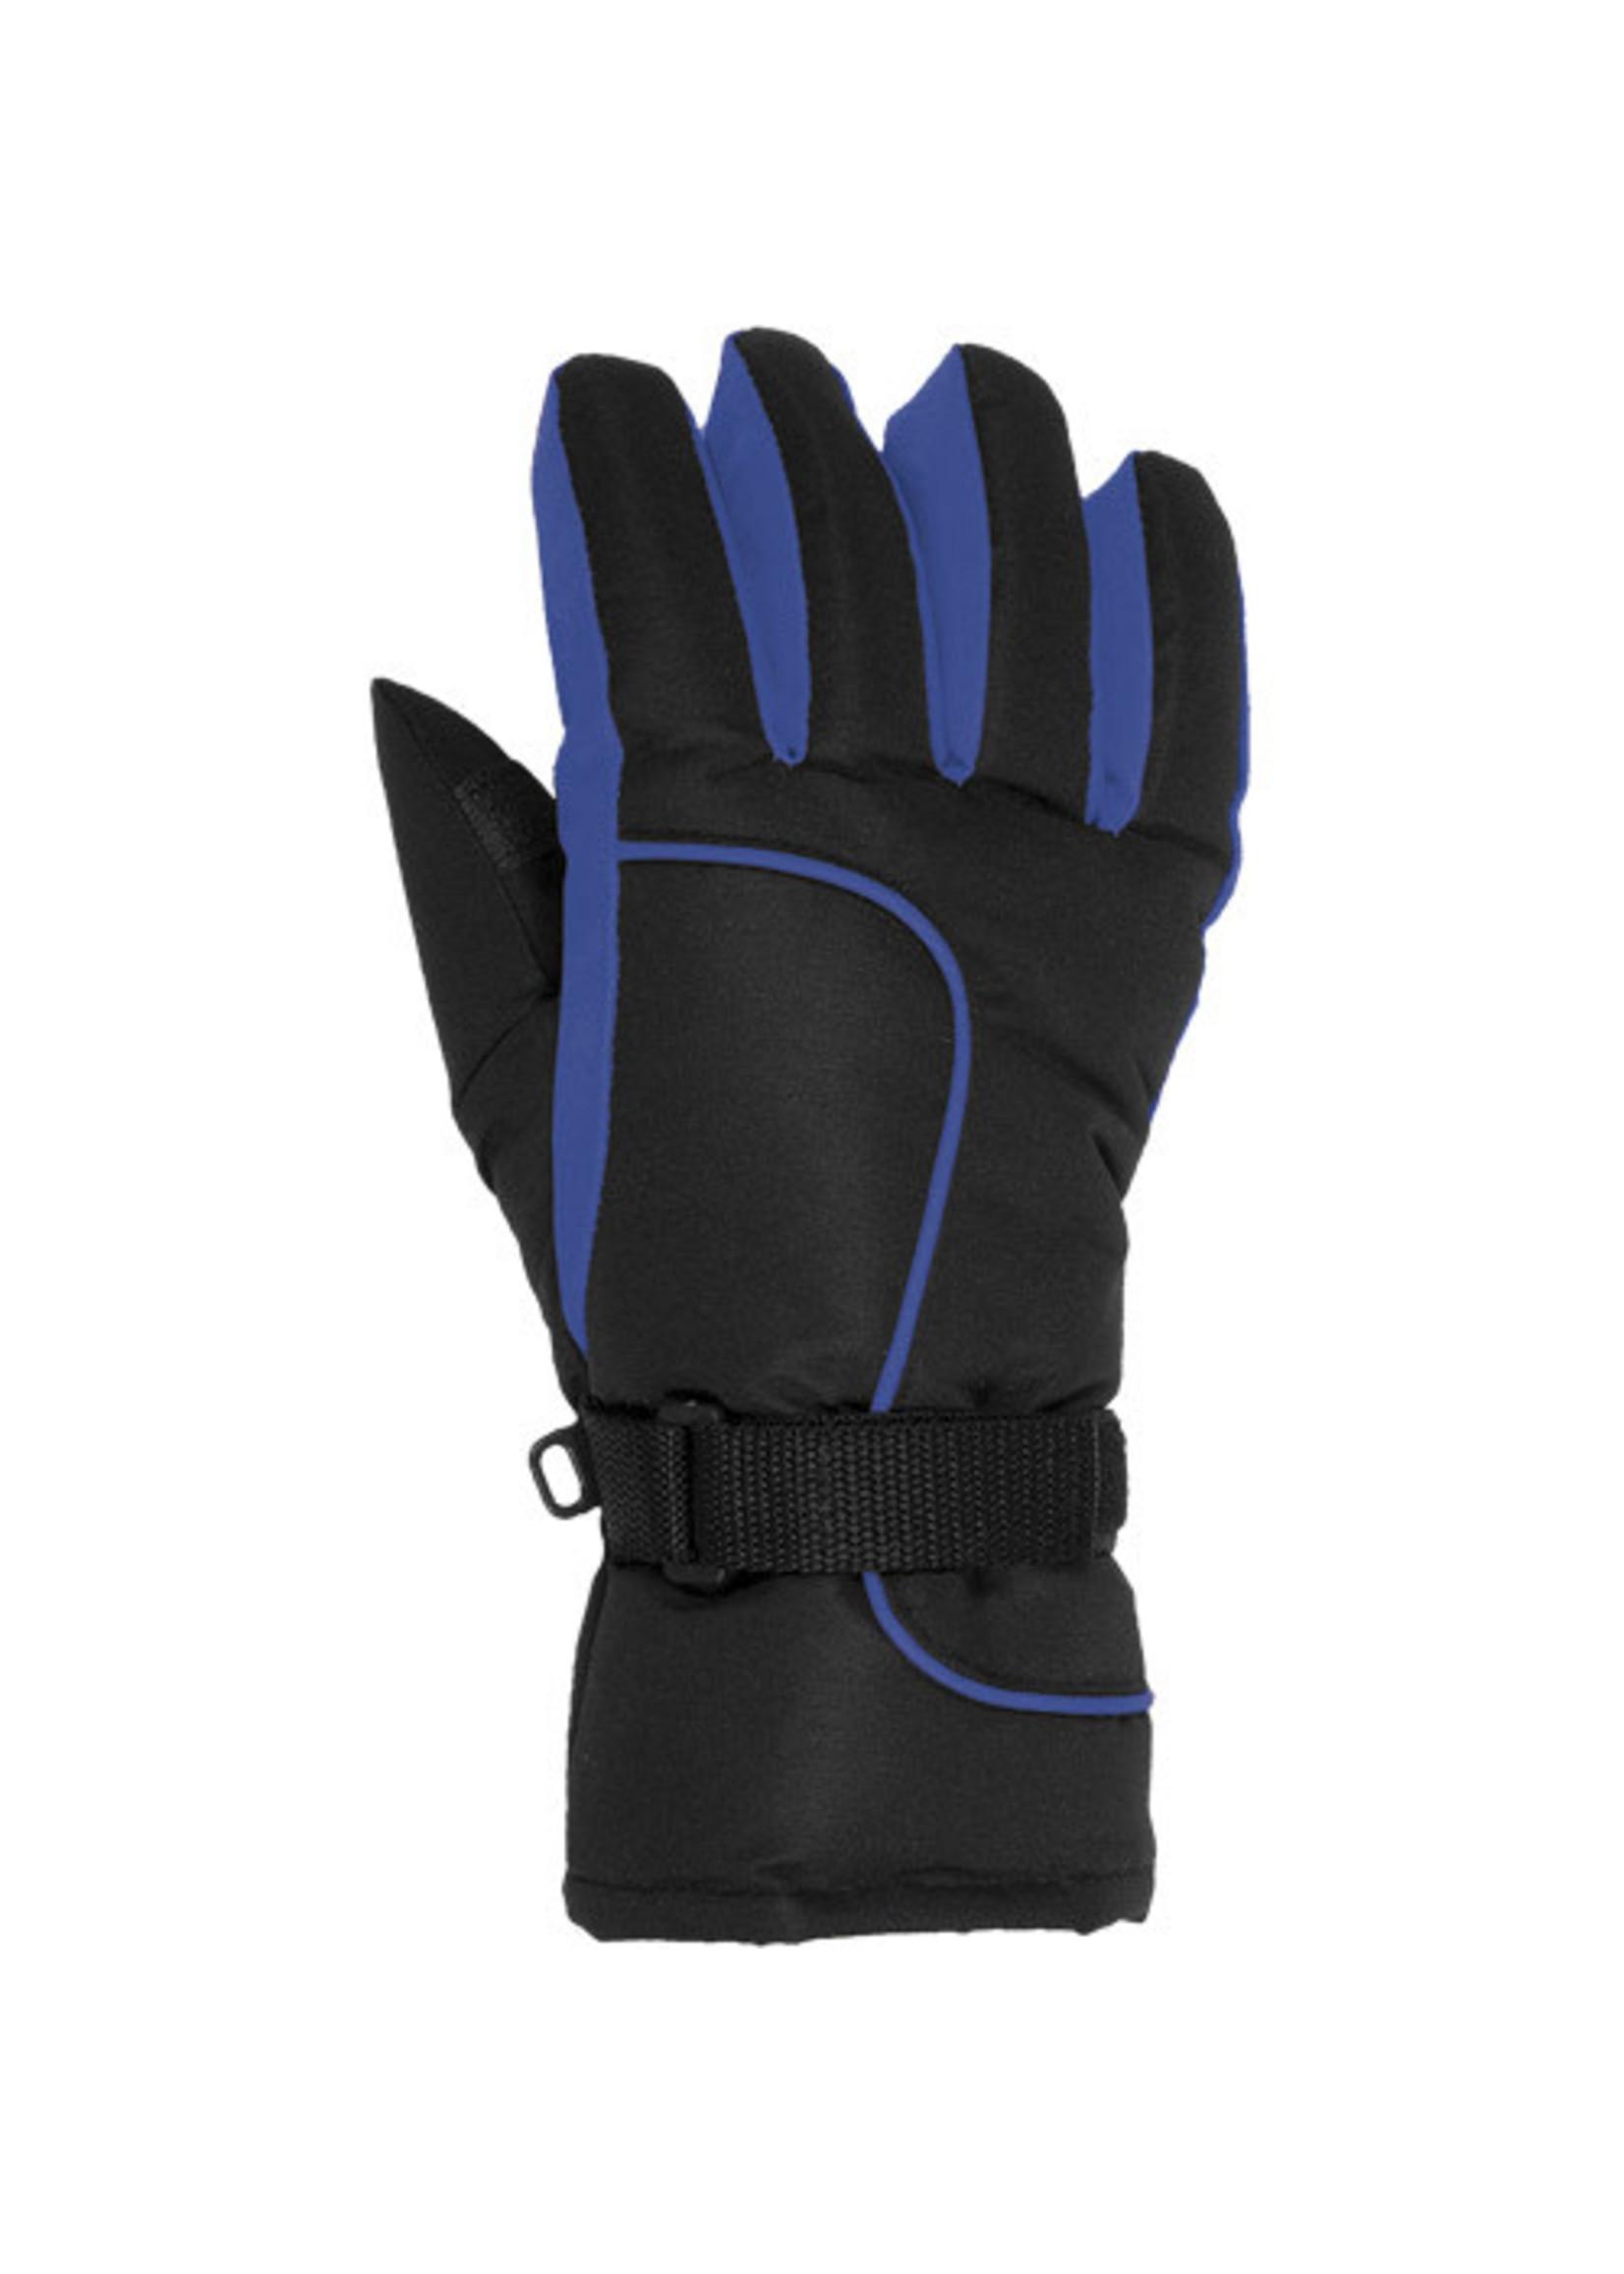 Choko Promo Nylon Gloves Youth Royal XS